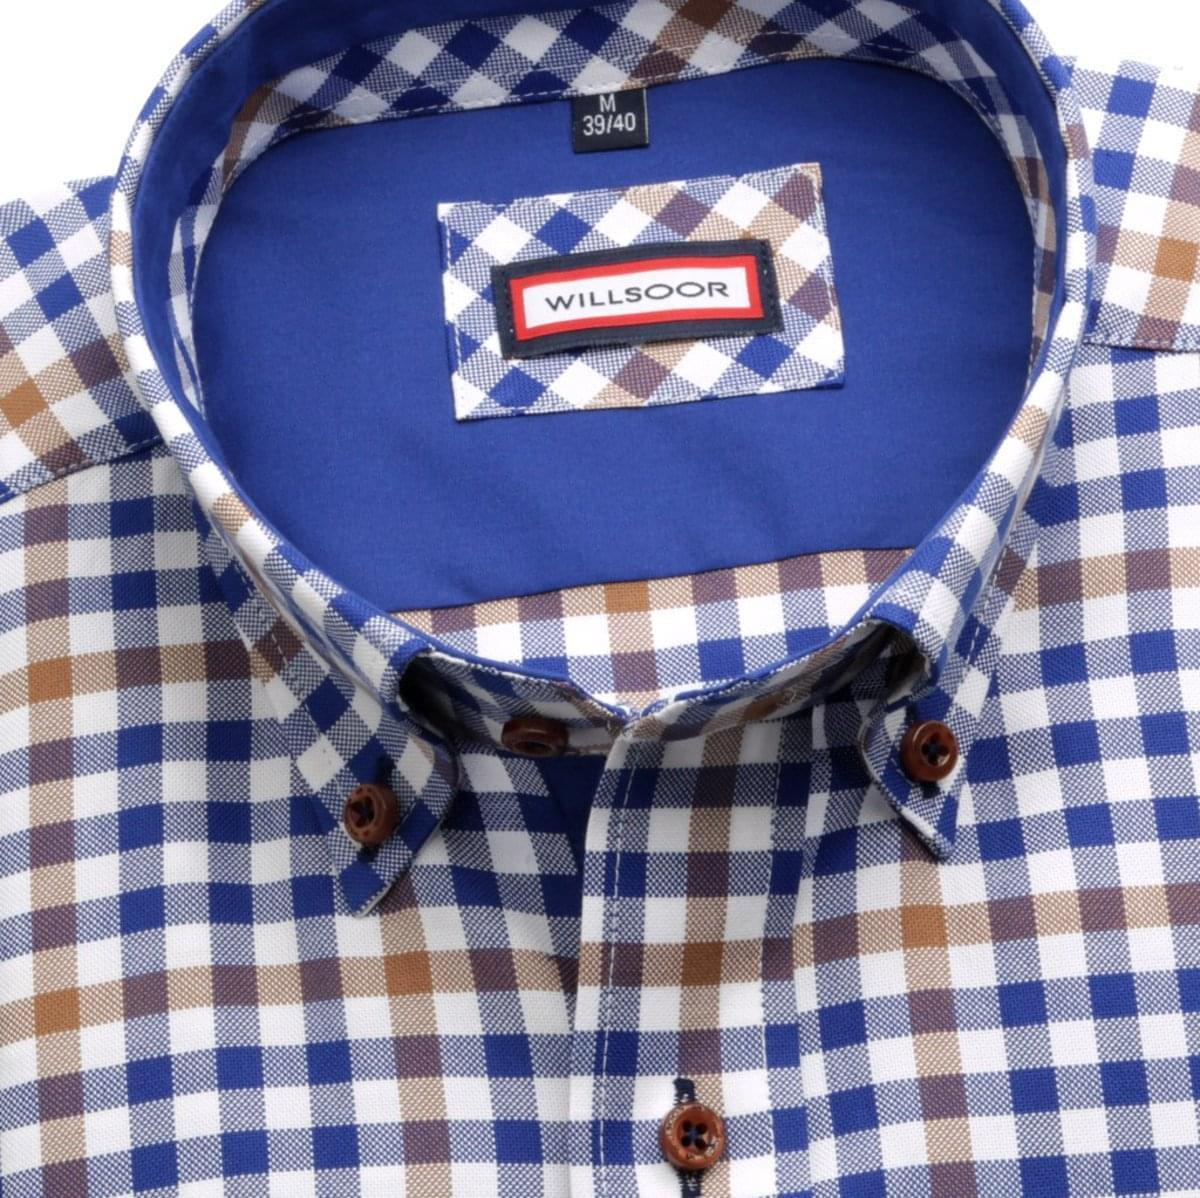 Pánská košile Slim Fit (výška 176-182) 5824 s barevnou kostkou 176-182 / XL (43/44)